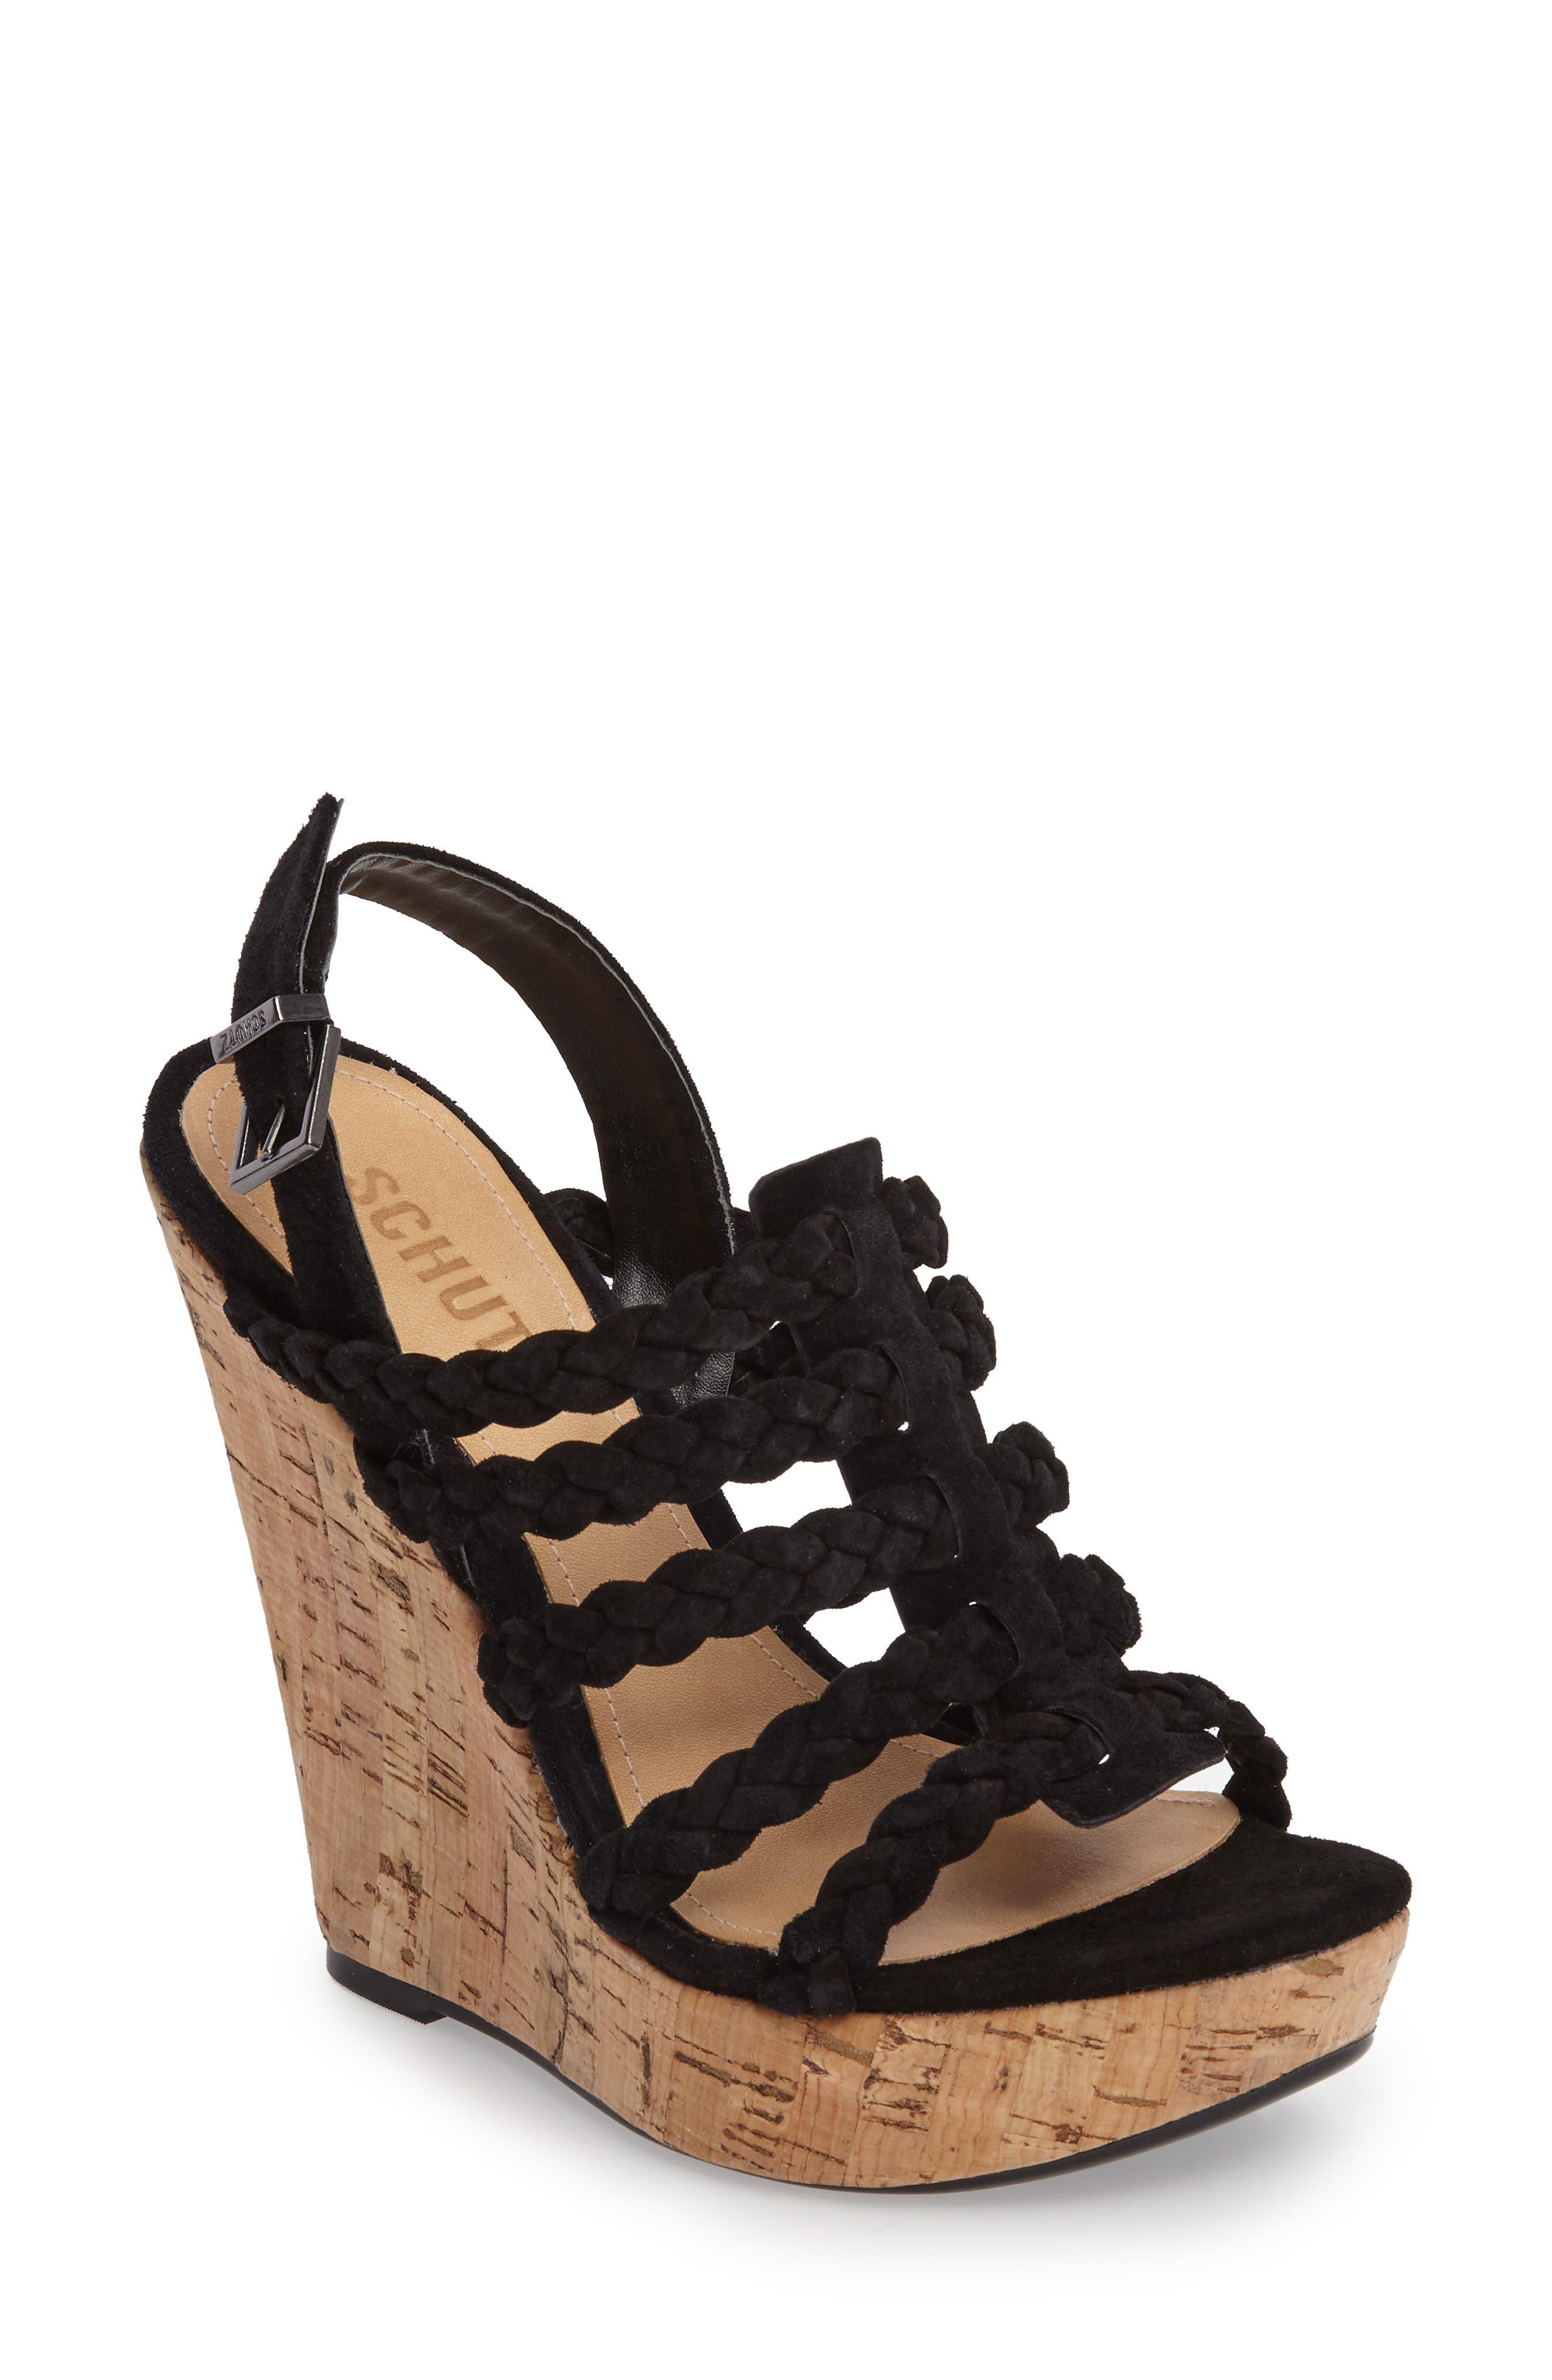 Abigally Wedge Sandal,                         Main,                         color, 001